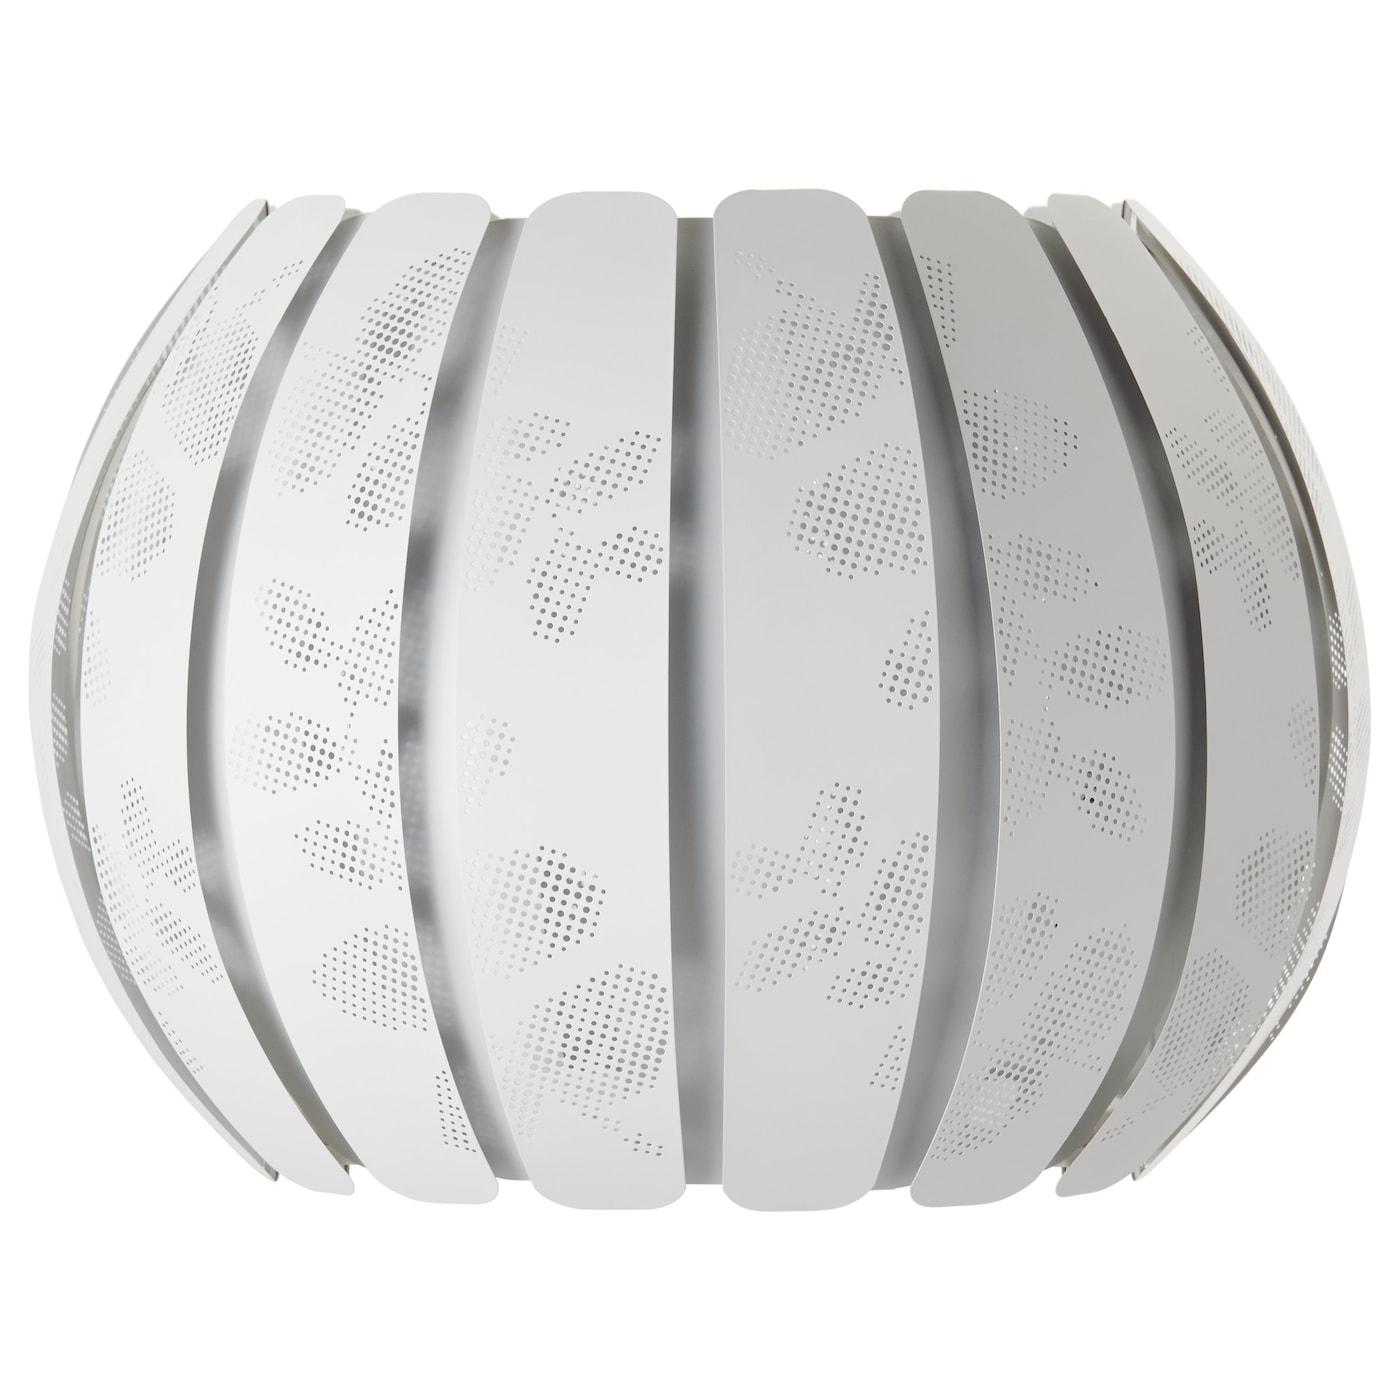 Ikea Överud Lamp Shade